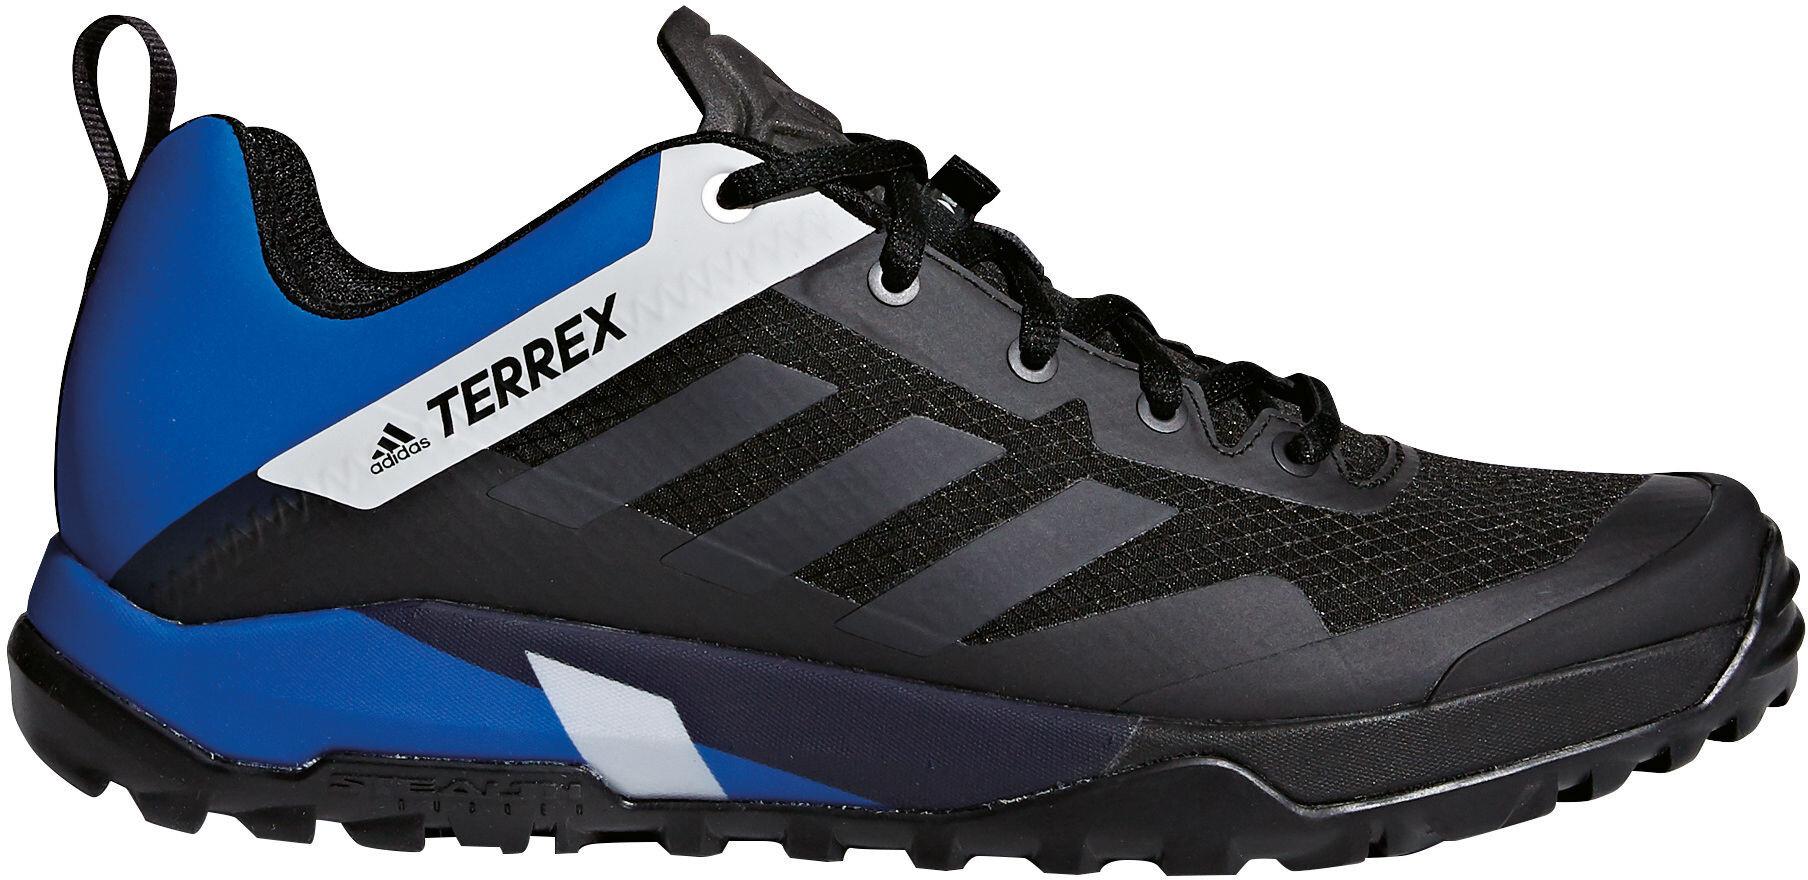 adidas TERREX Trail Cross Sl Scarpe Uomo blu/nero